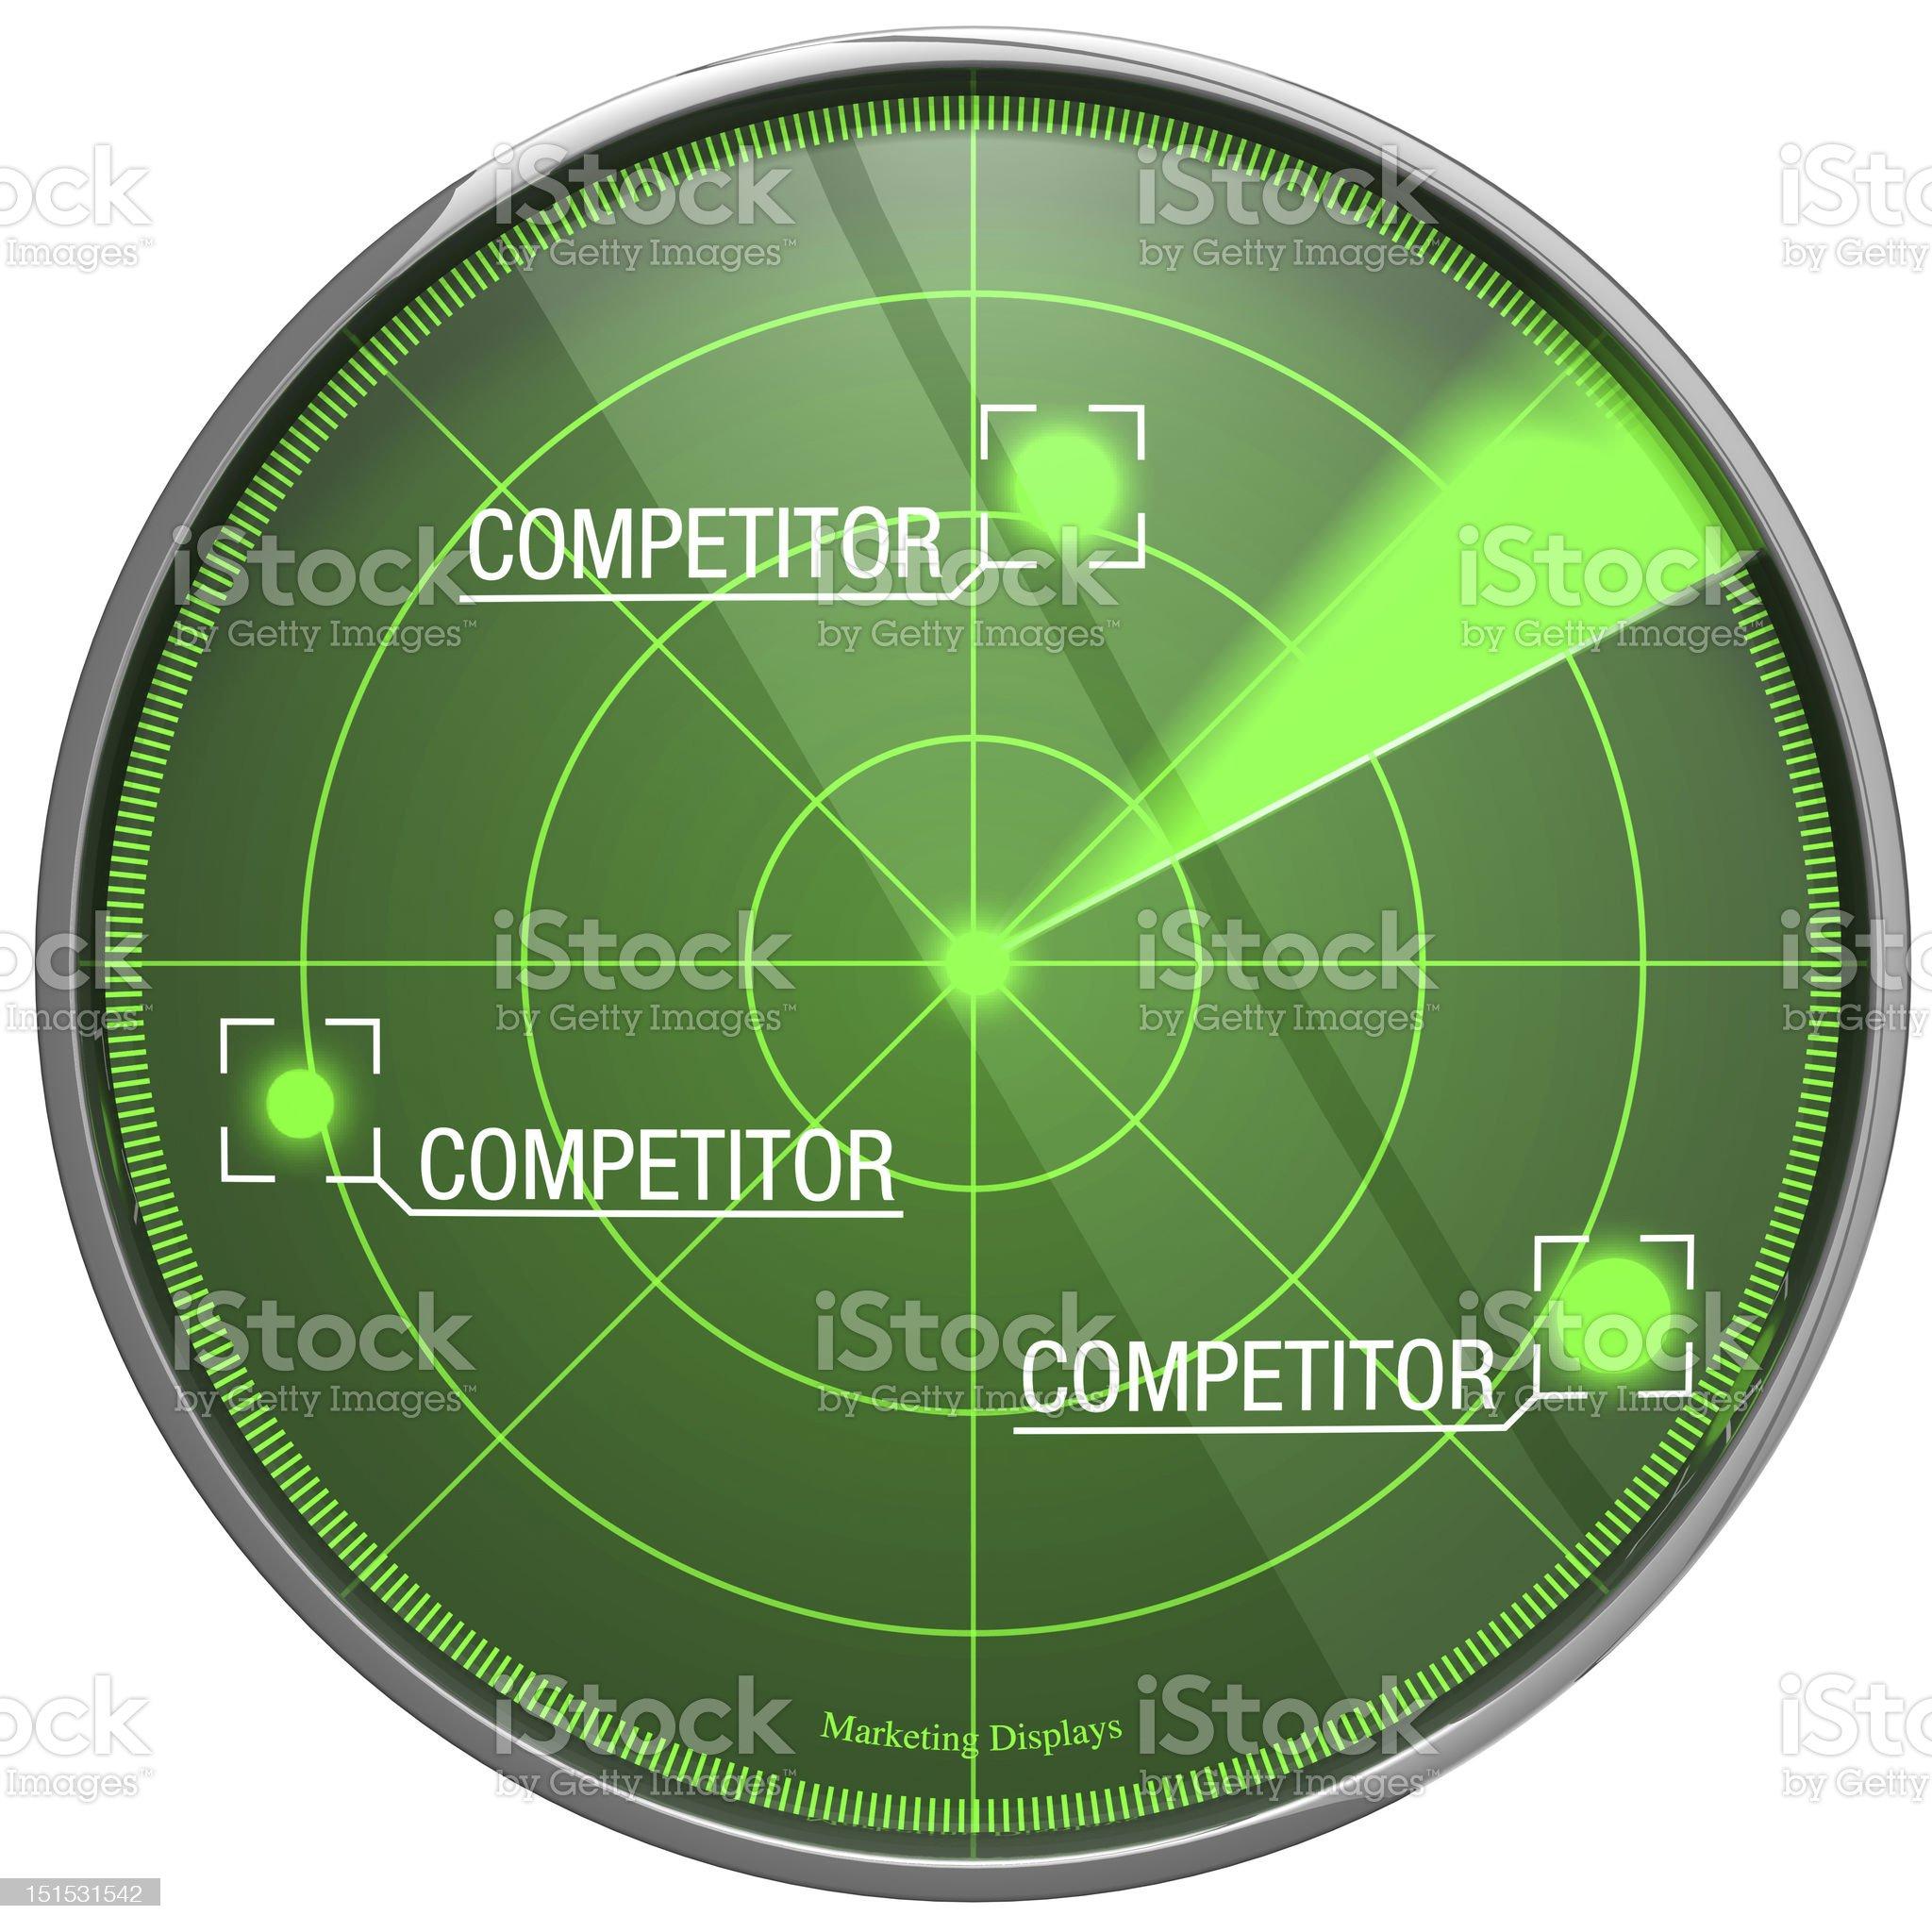 Marketing-Radar2 royalty-free stock photo